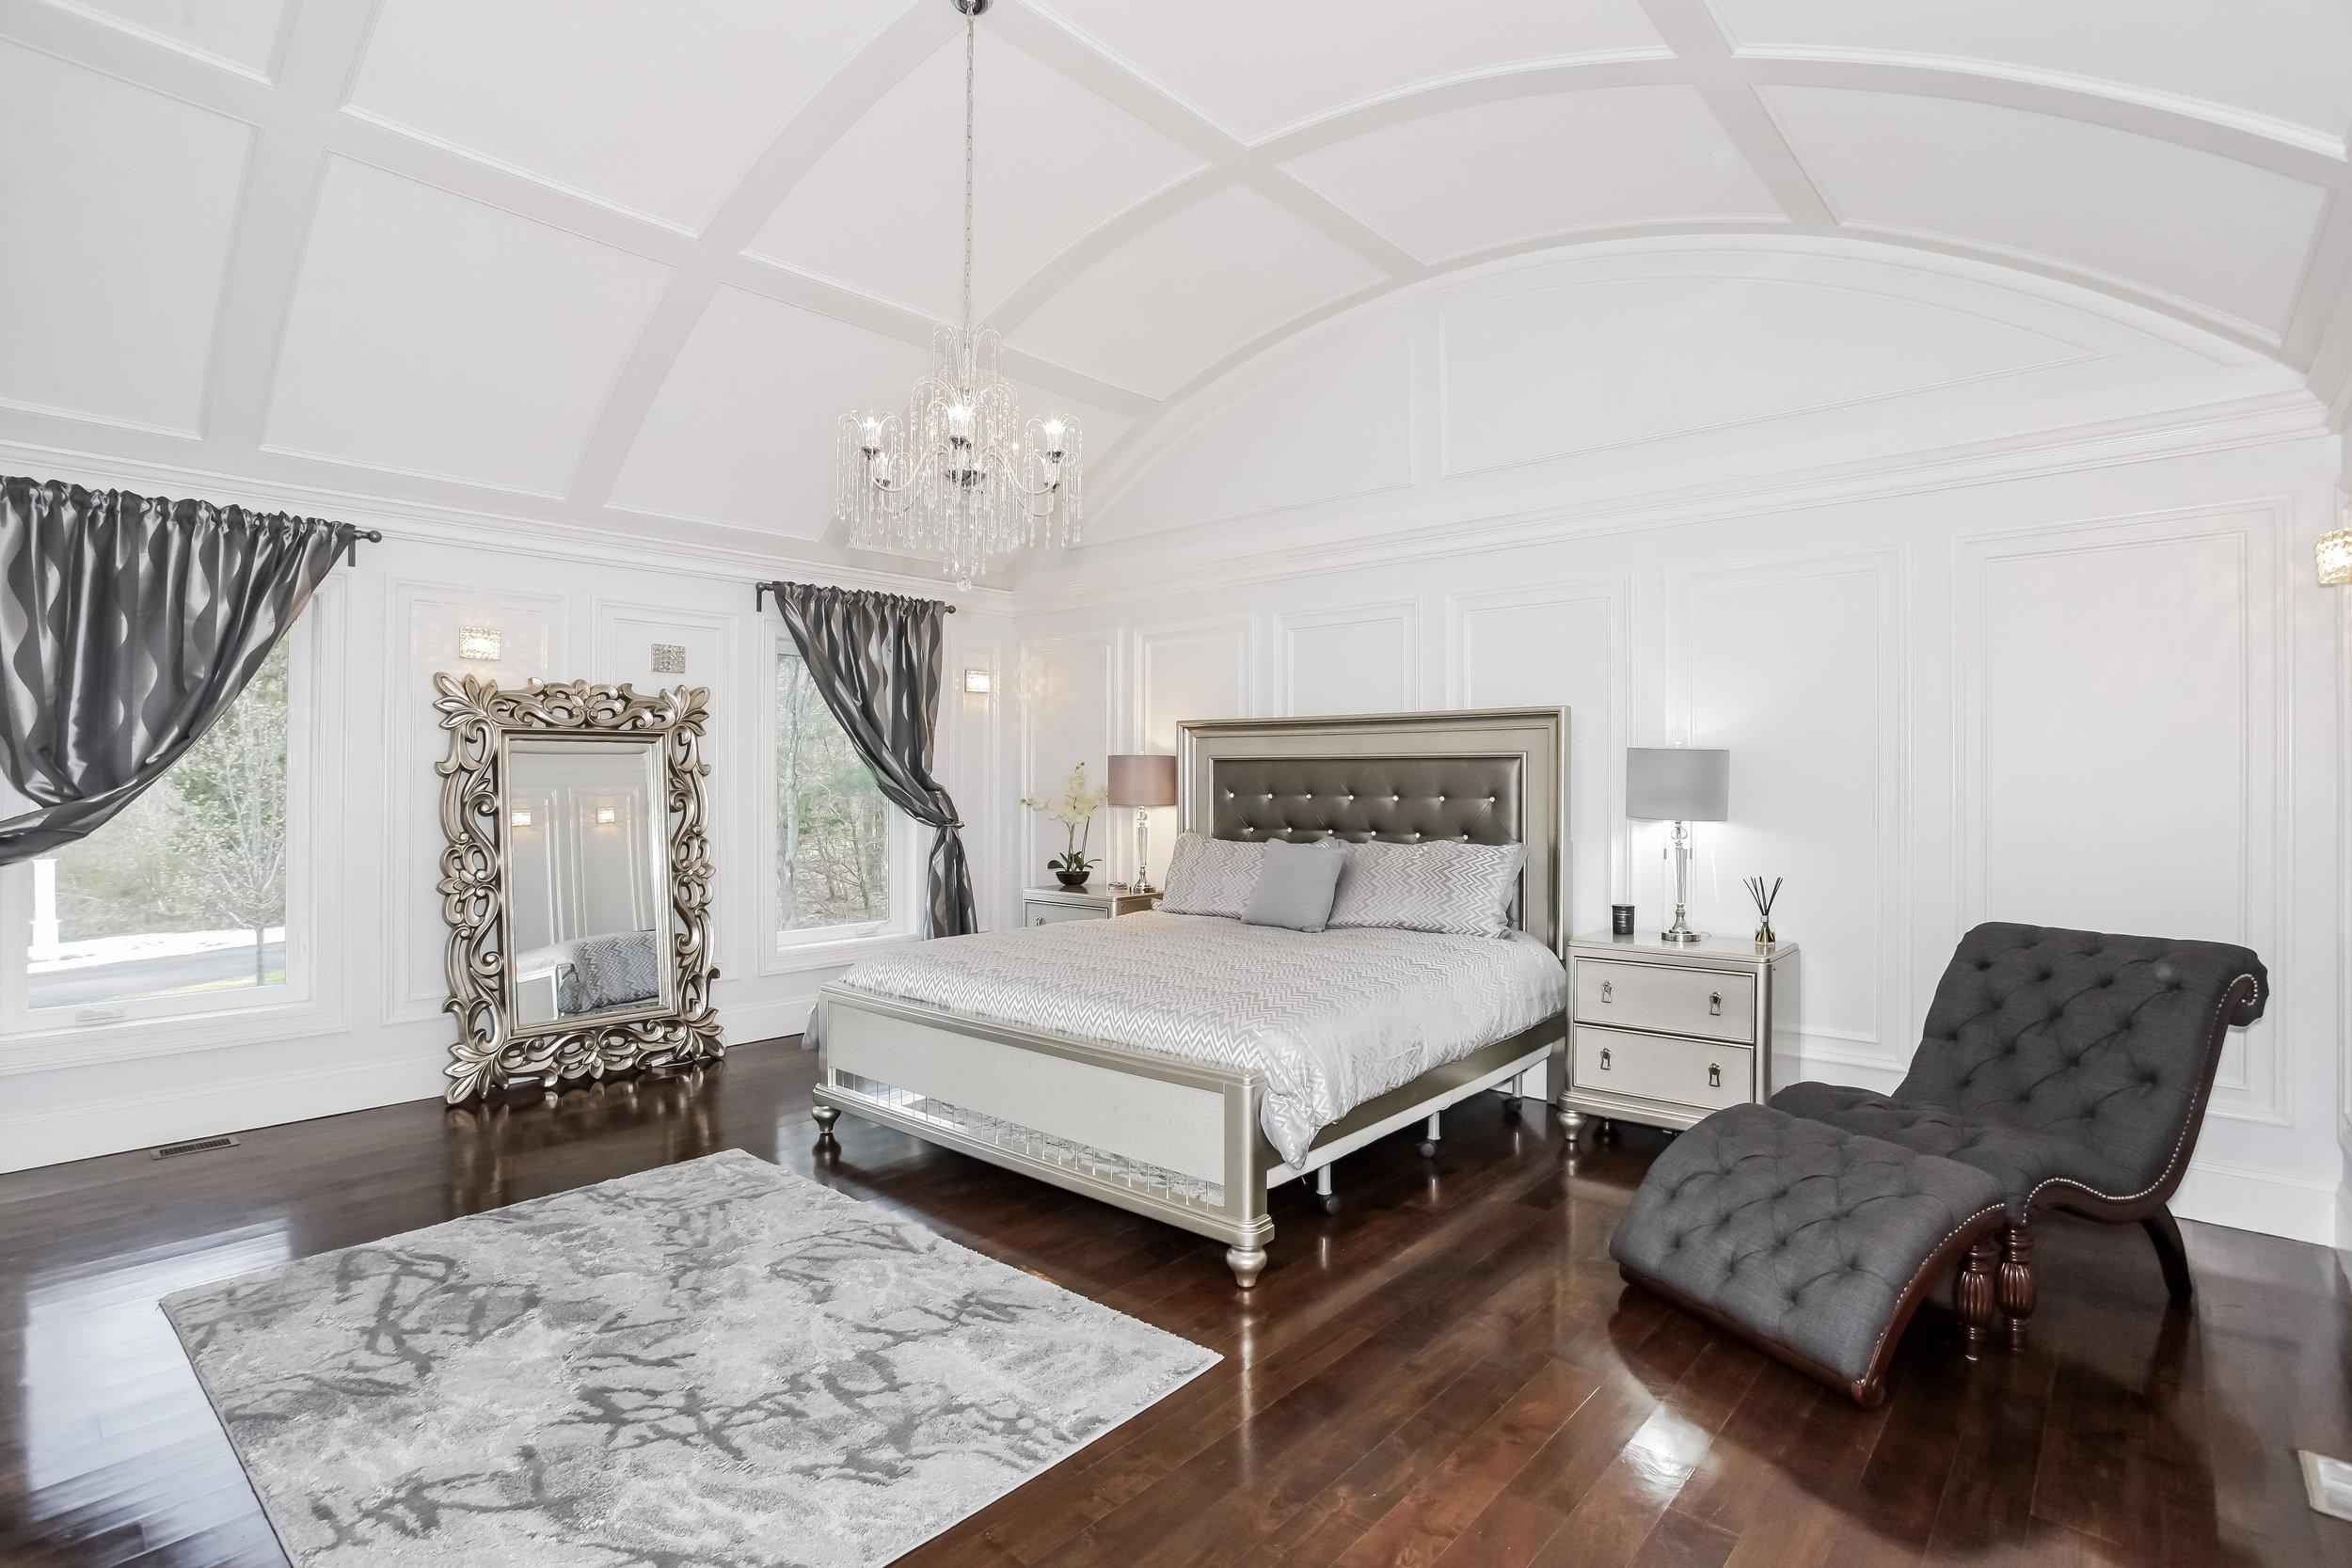 017-Master_Bedroom-2617894-large.jpg